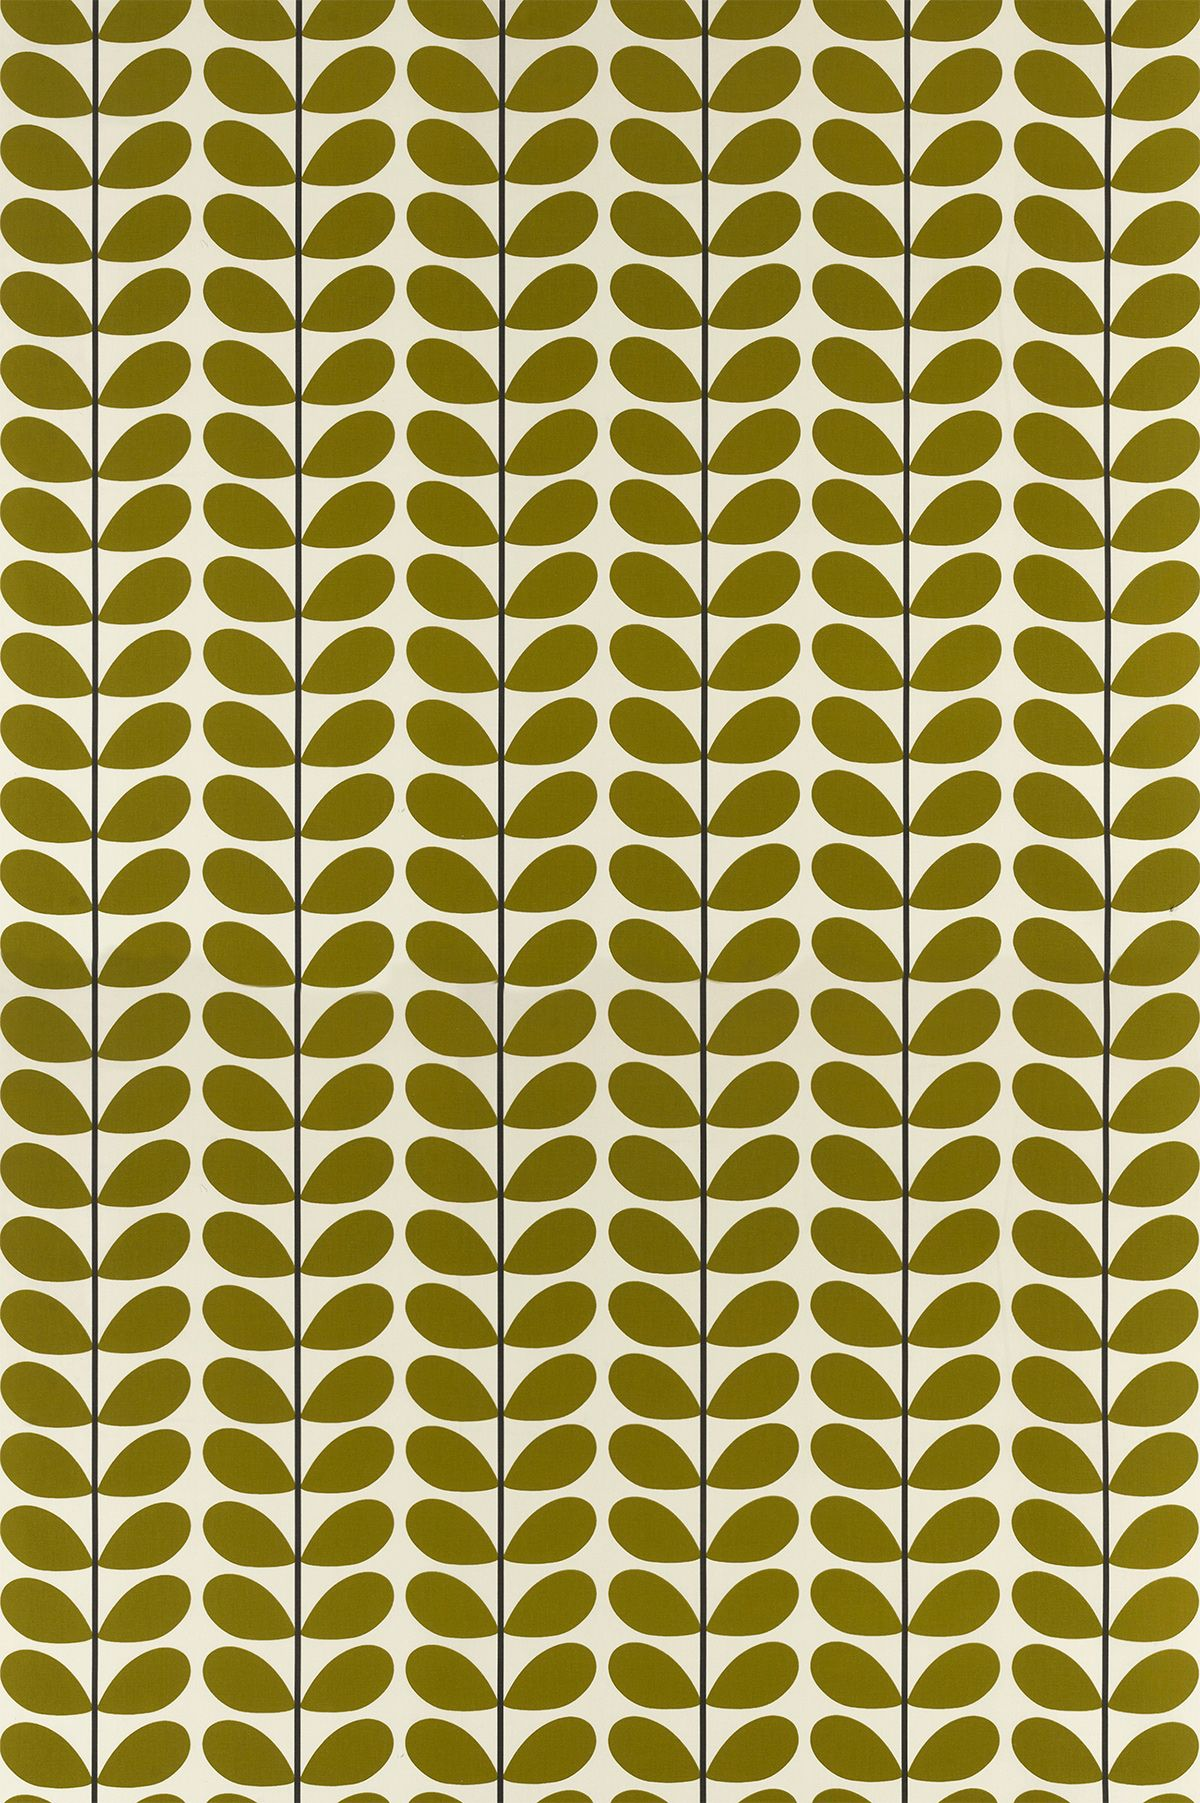 Orla kiely two colour stem olive fabric main image inspiration